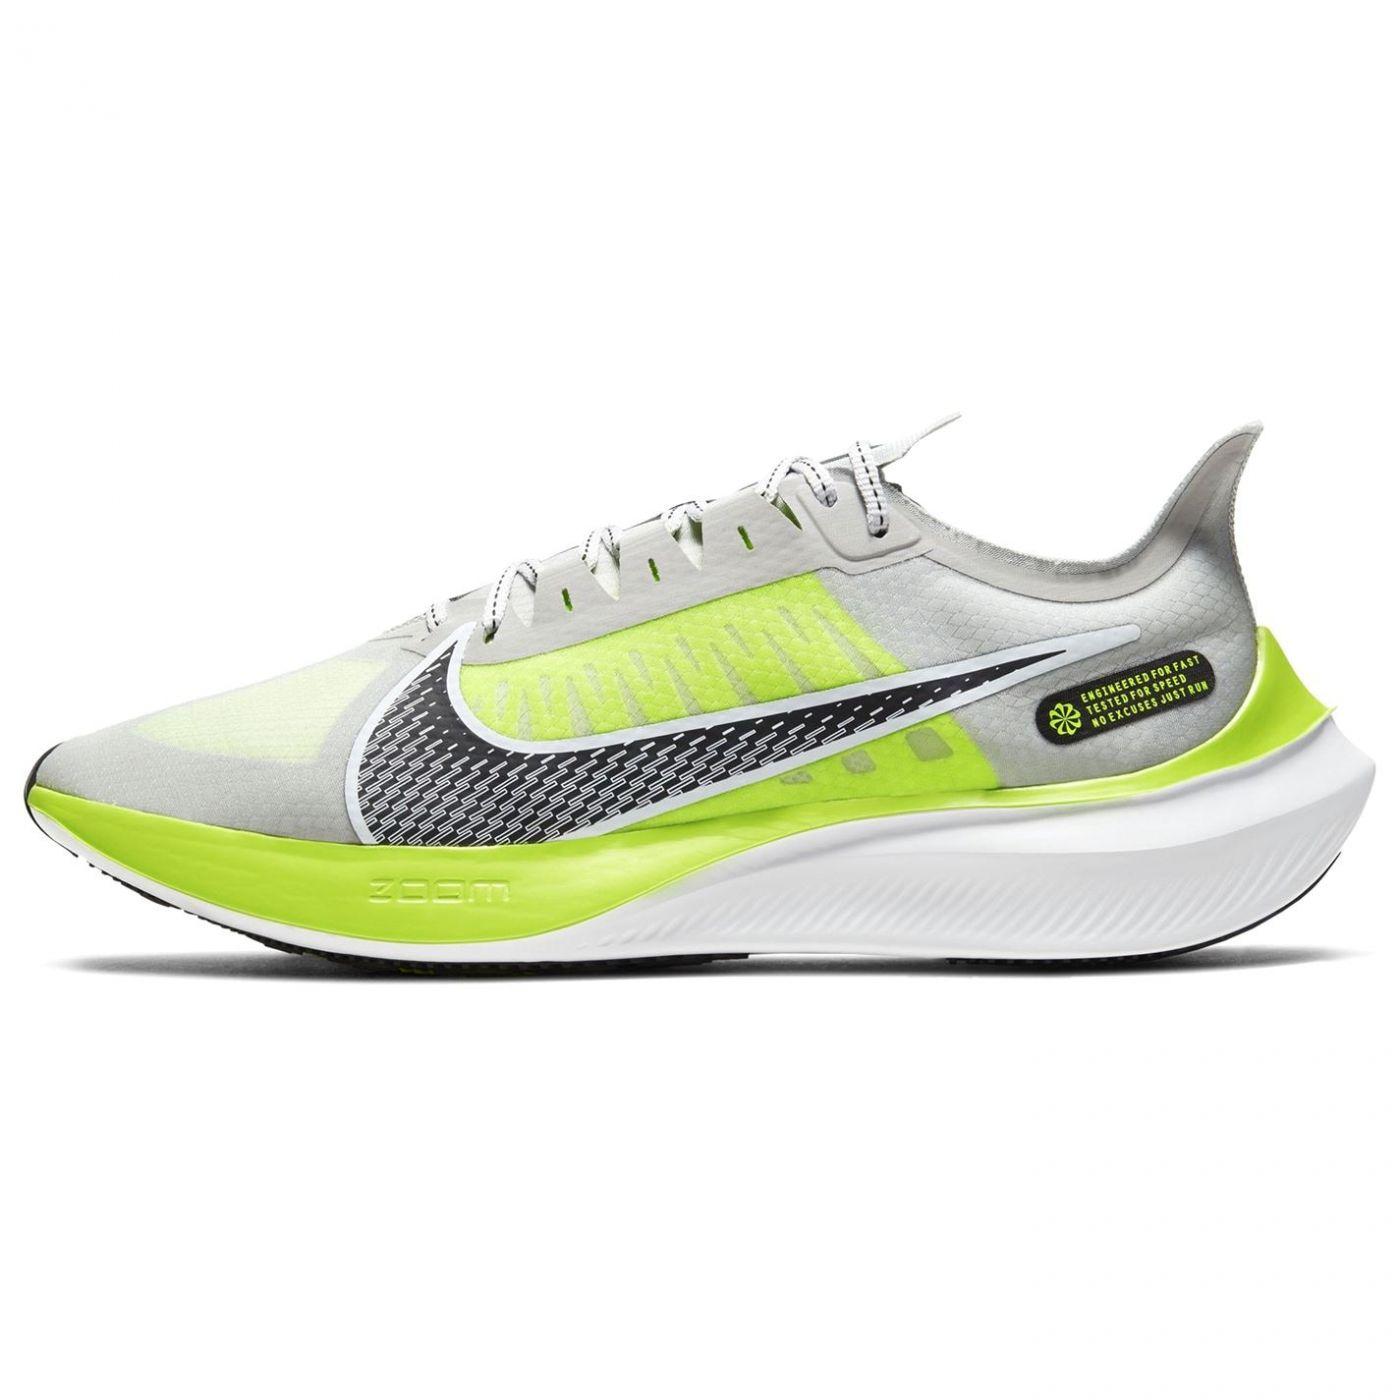 Men's trainers Nike Zoom Gravity